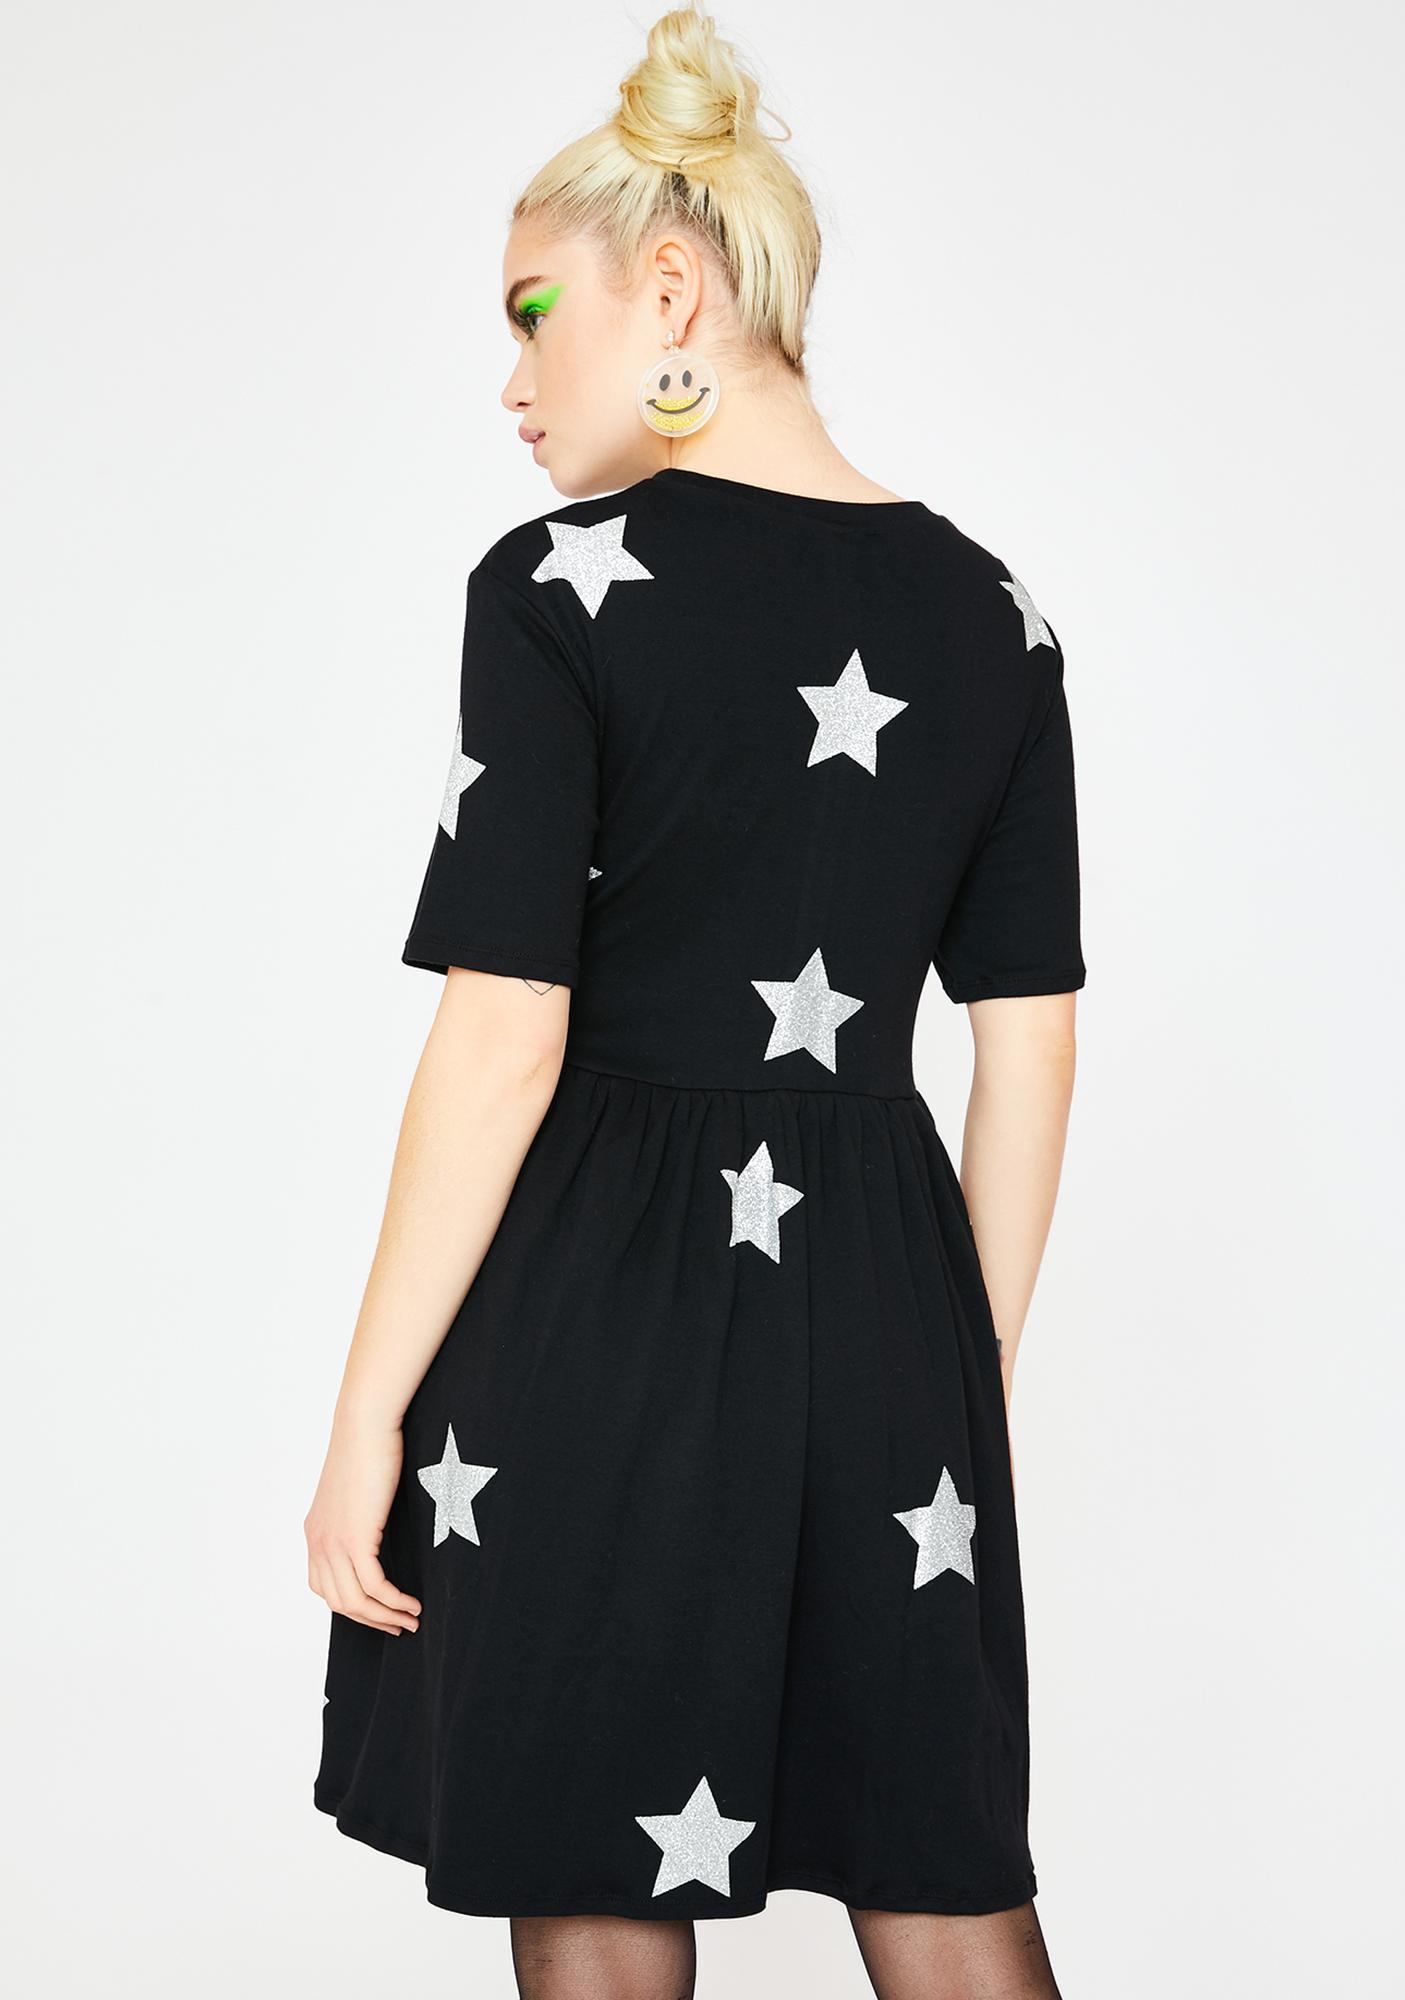 Tallulah's Threads Glitter Star Party Dress